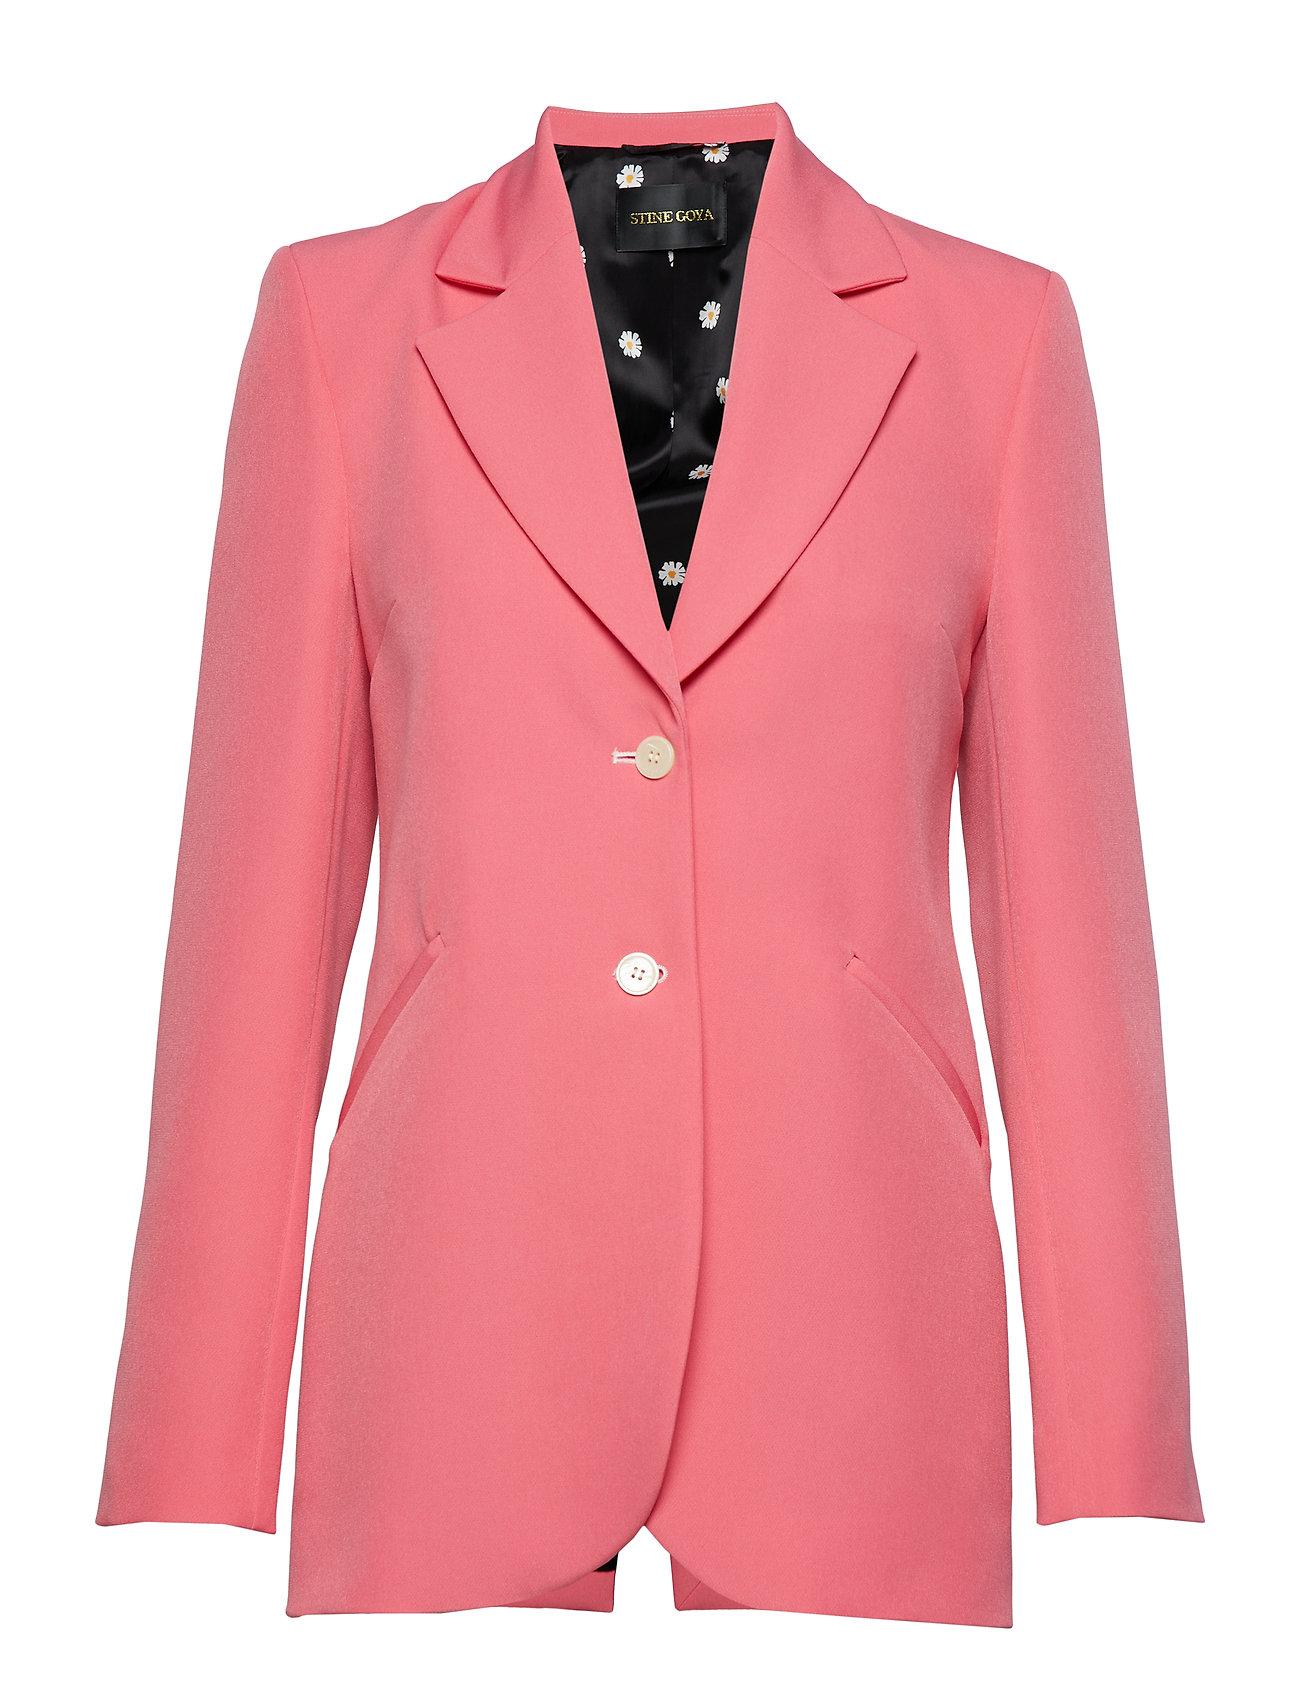 STINE GOYA Florence, 617 Solid Tailoring - 1460 ROSE